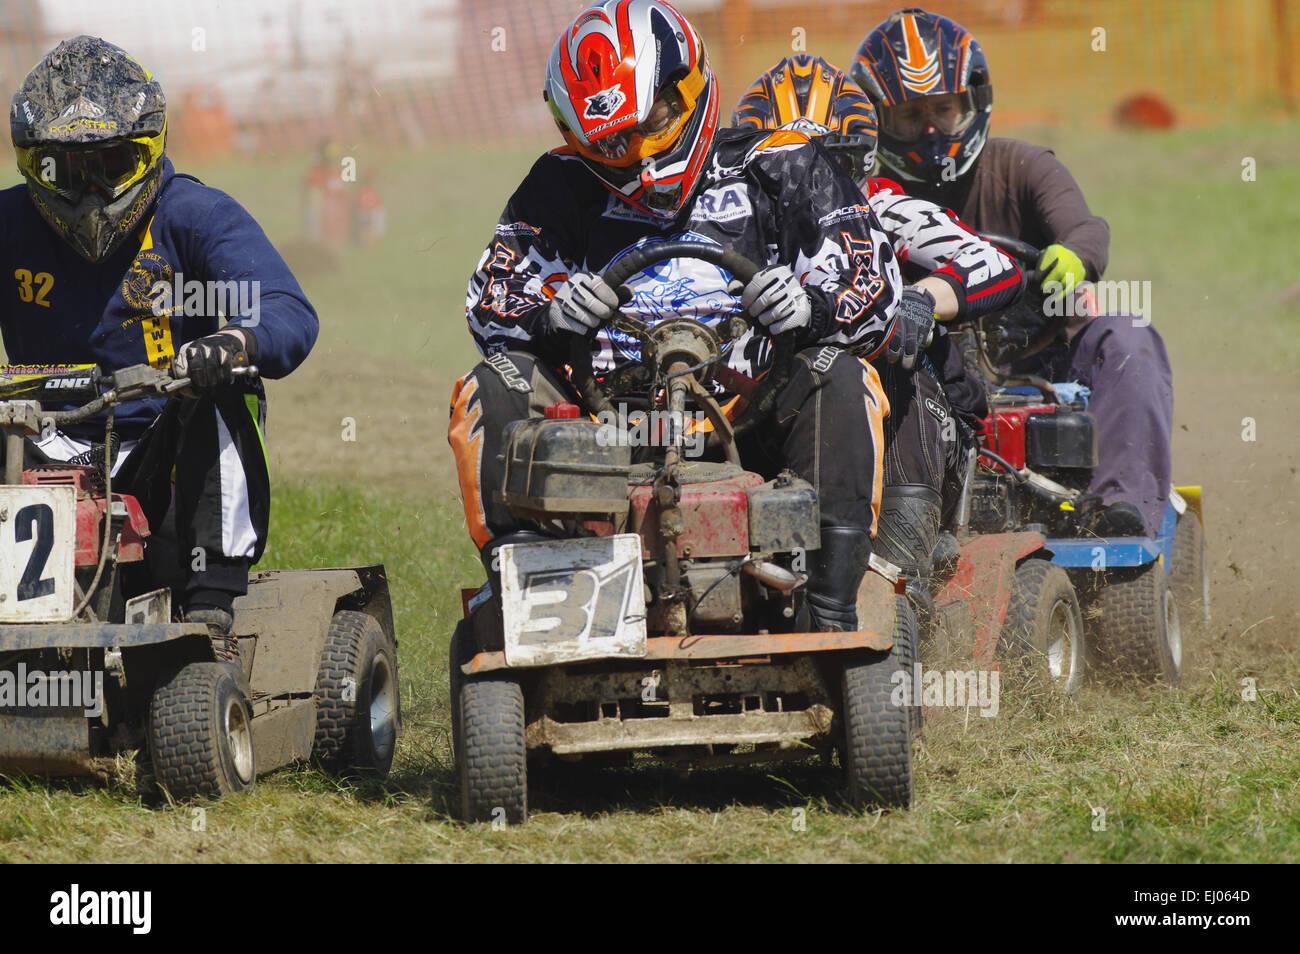 Lawnmower Racing, Anglesey, Showground - Stock Image